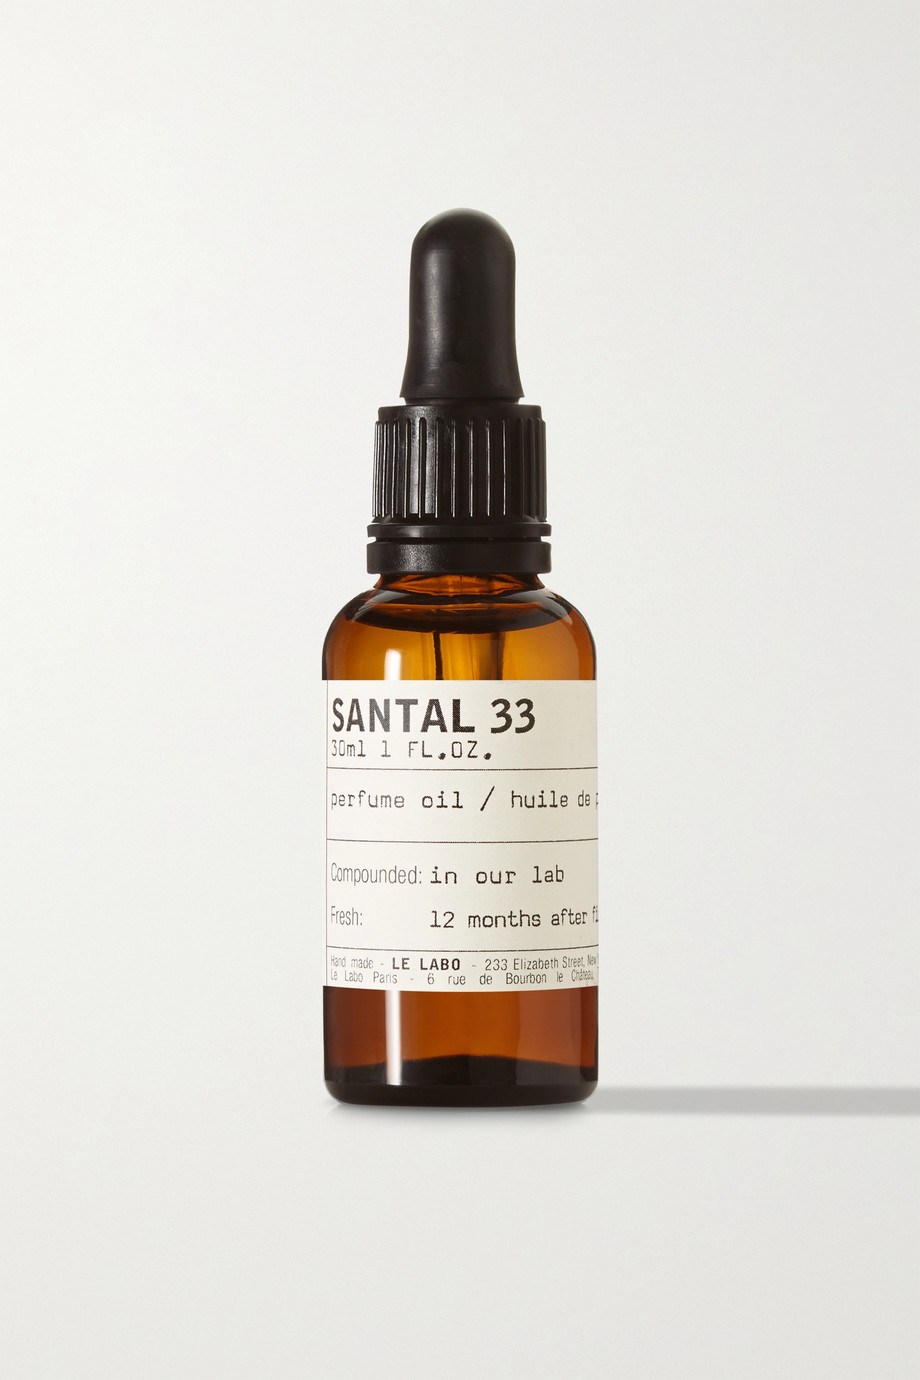 Perfume Oil - Santal 33, 30ml, by Le Labo